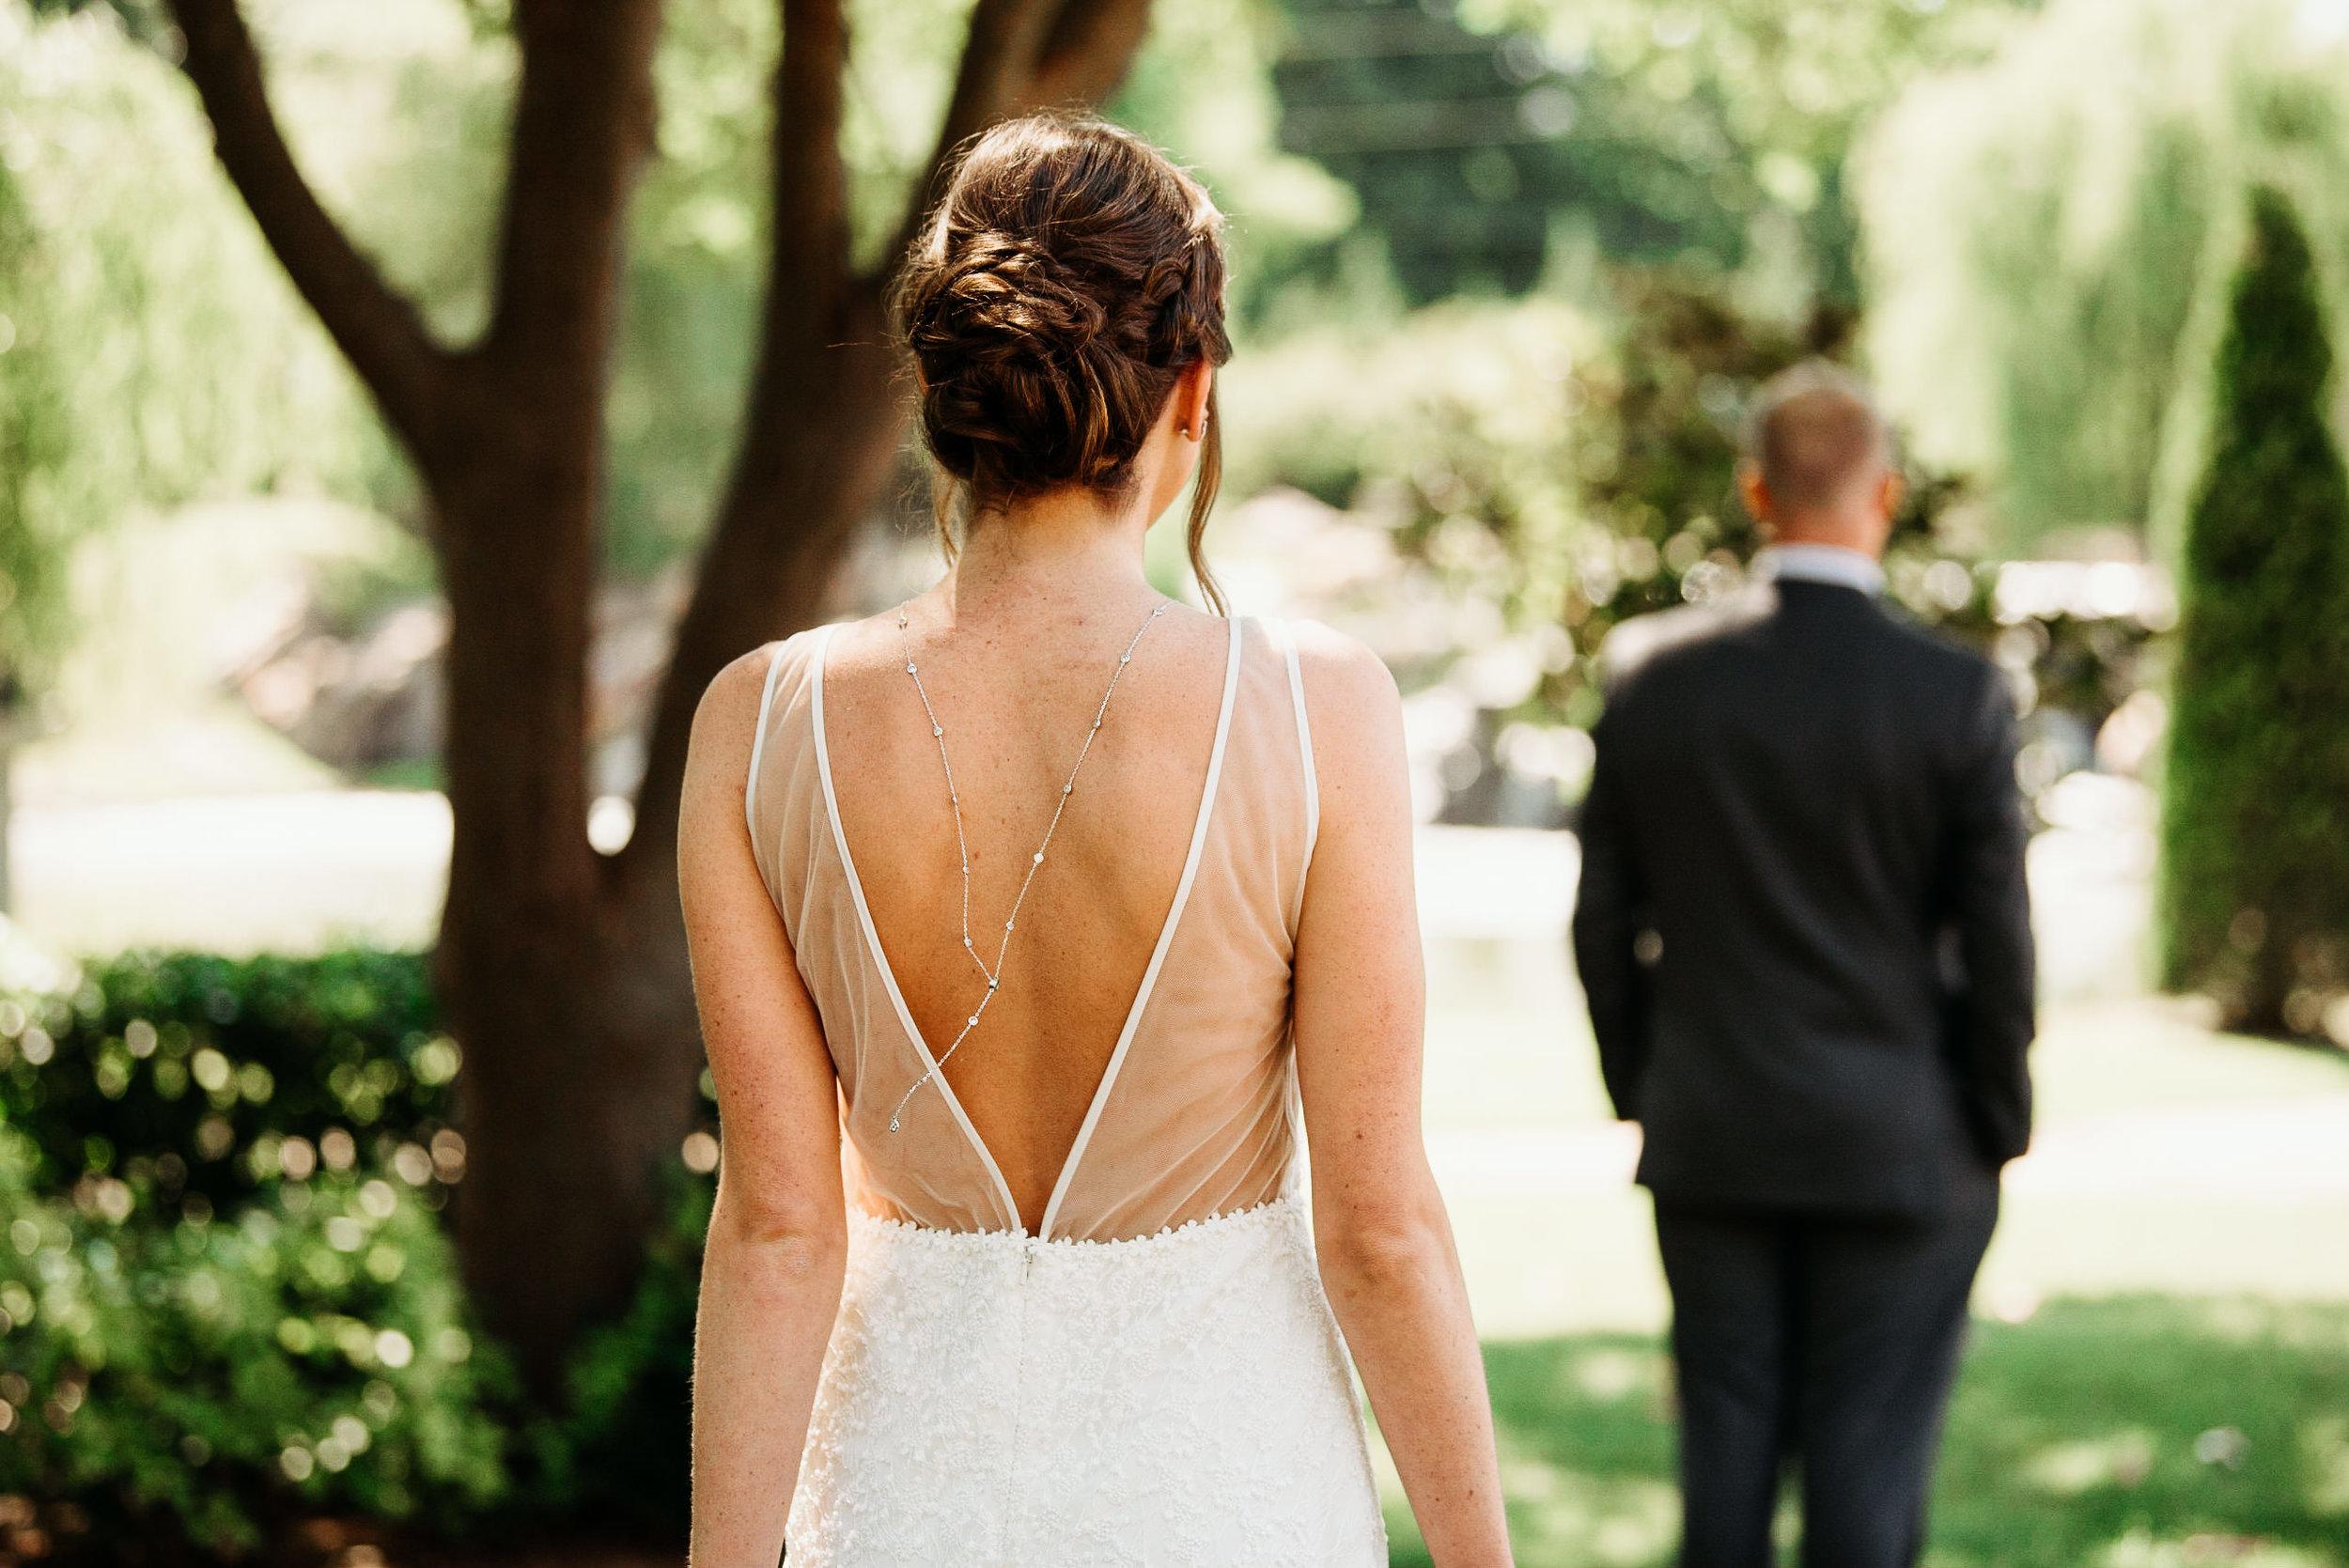 okc-wedding-photographer-coles-garden-wedding-okc-best-wedding-photographers-37.jpg